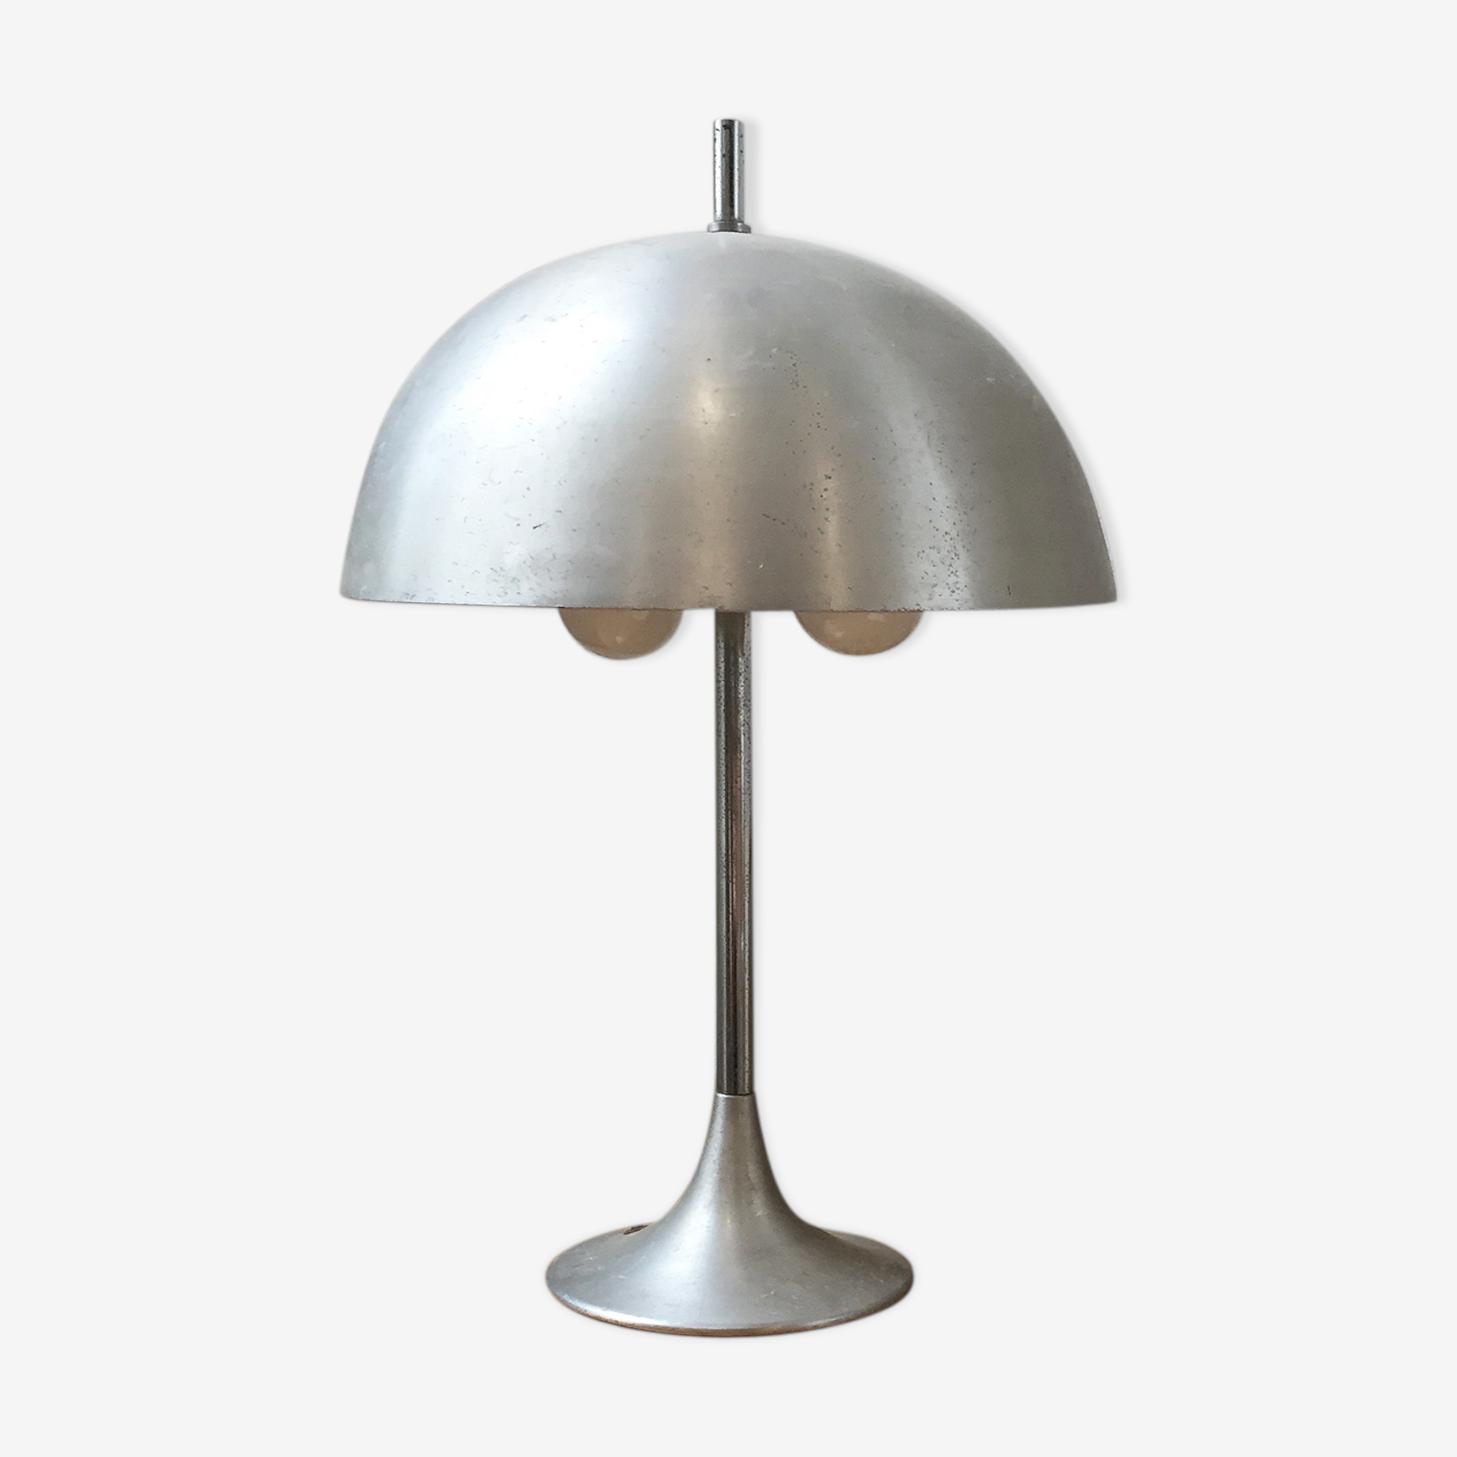 Lampe champignon disderot